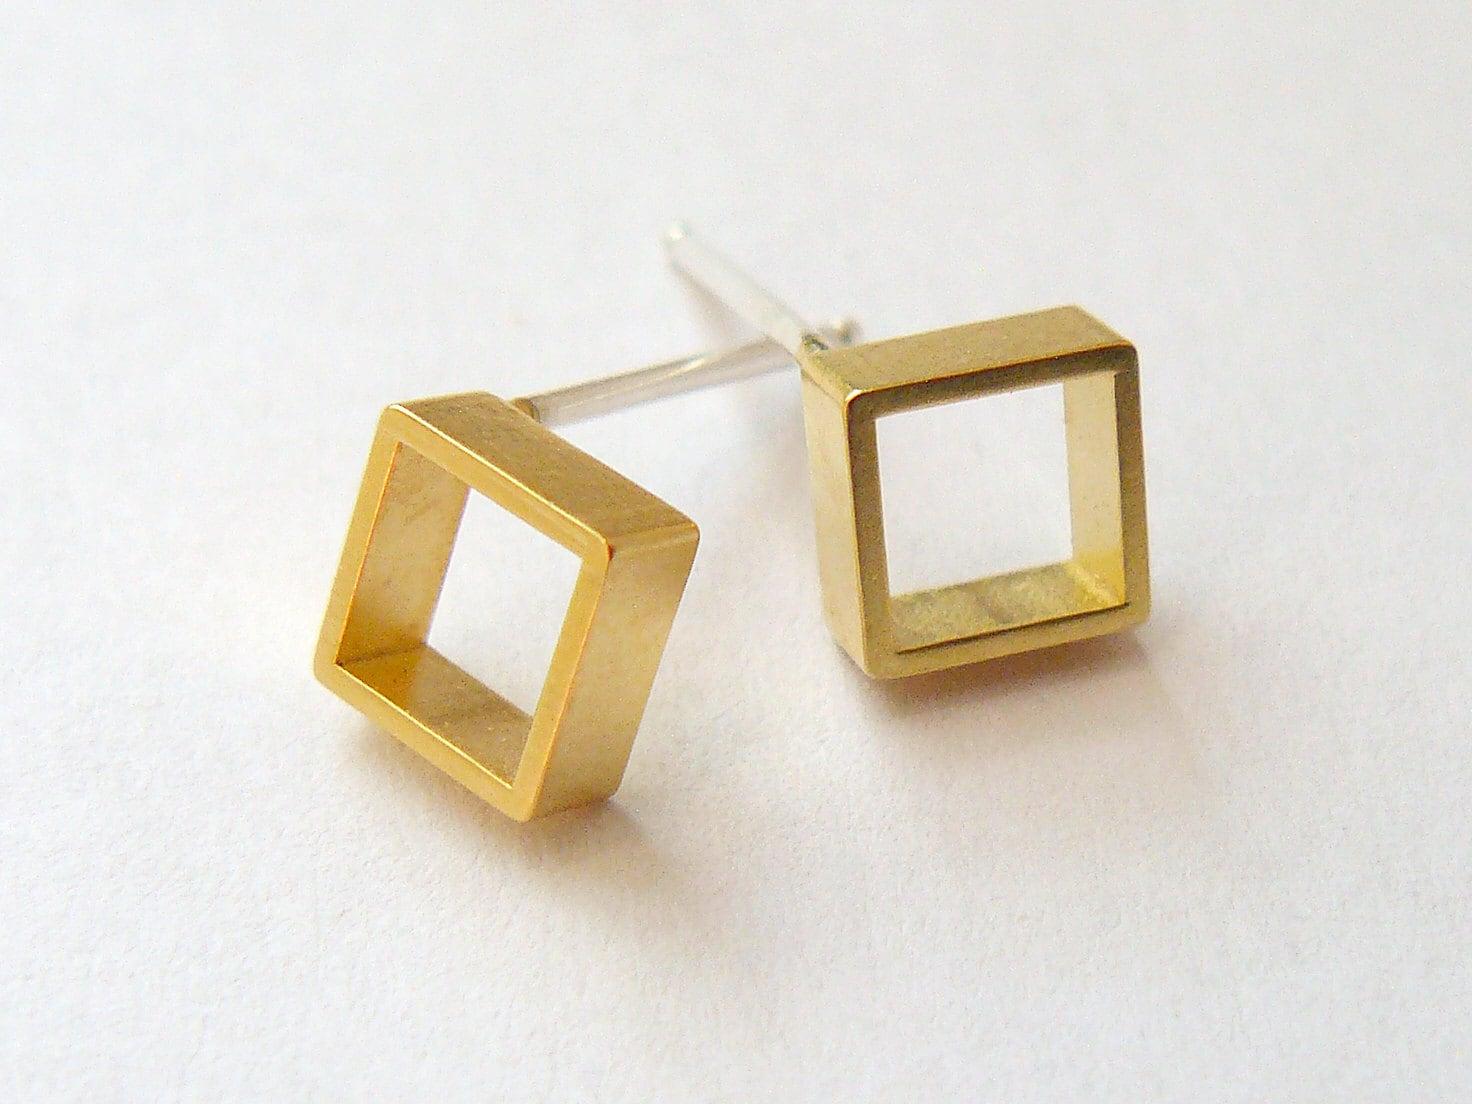 Gold Square Earring Studs Tiny Geometric Jewelry Gold Stud